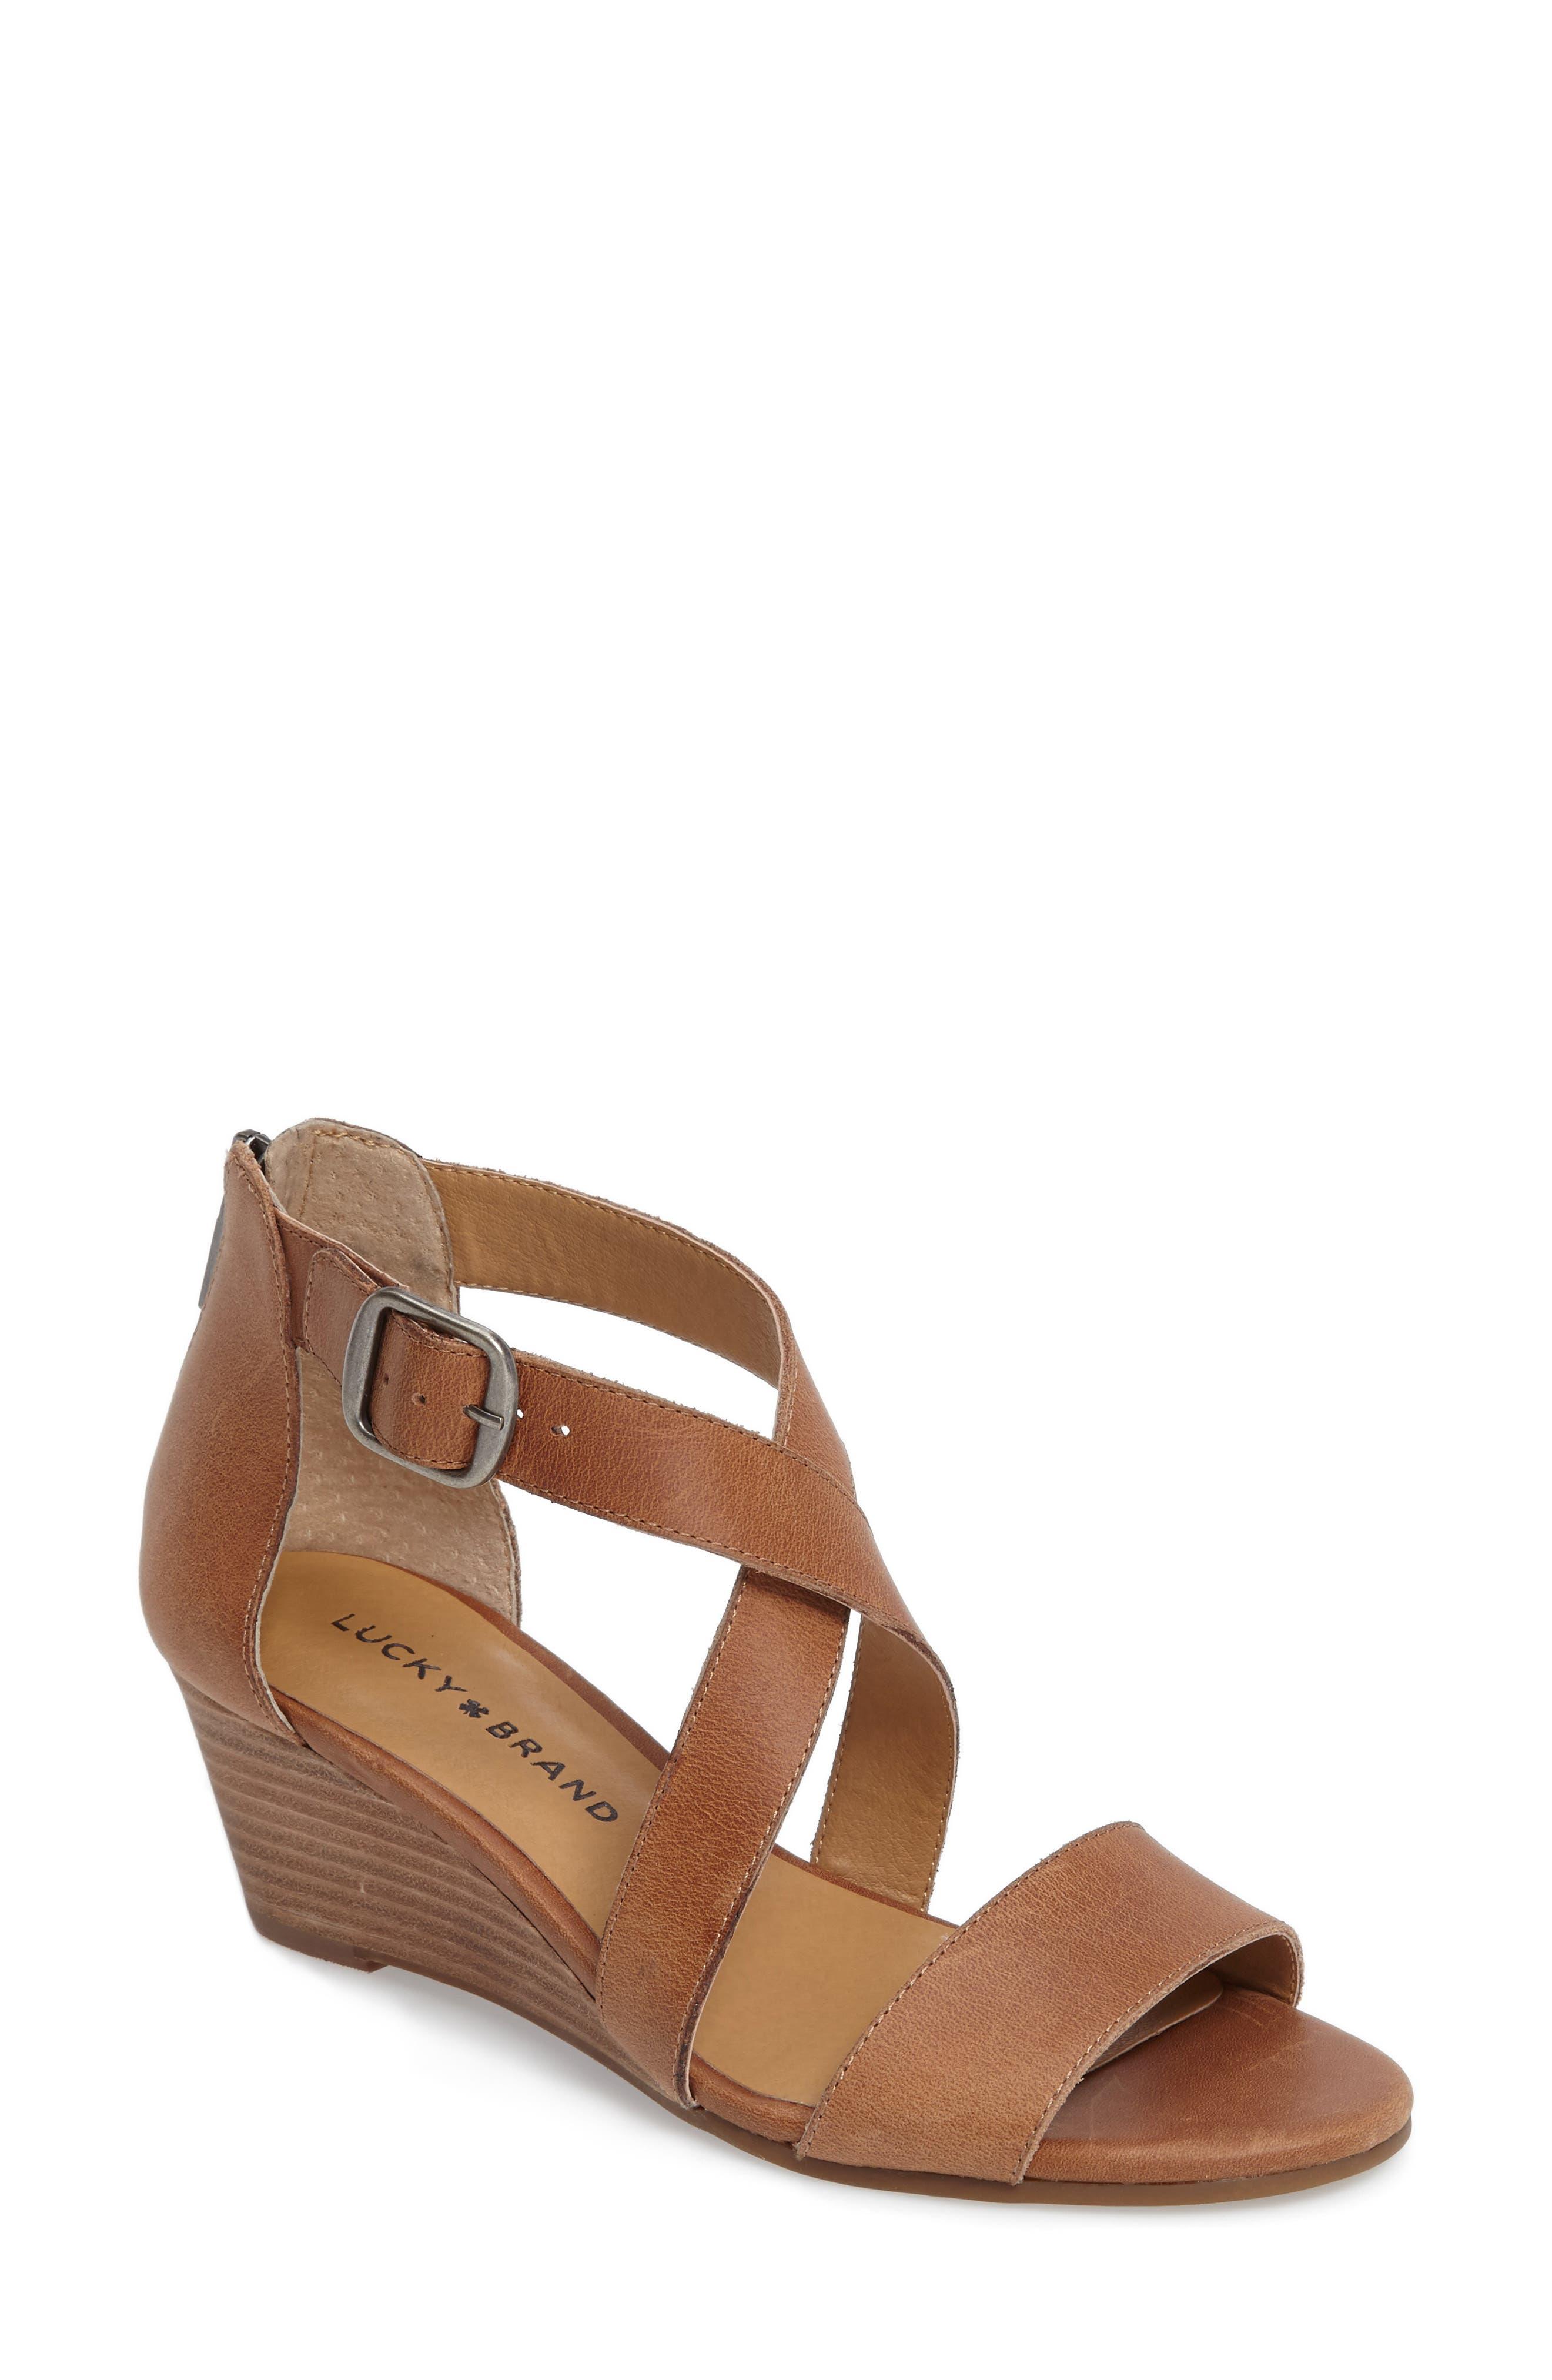 Main Image - Lucky Brand Jenley Wedge Sandal (Women)